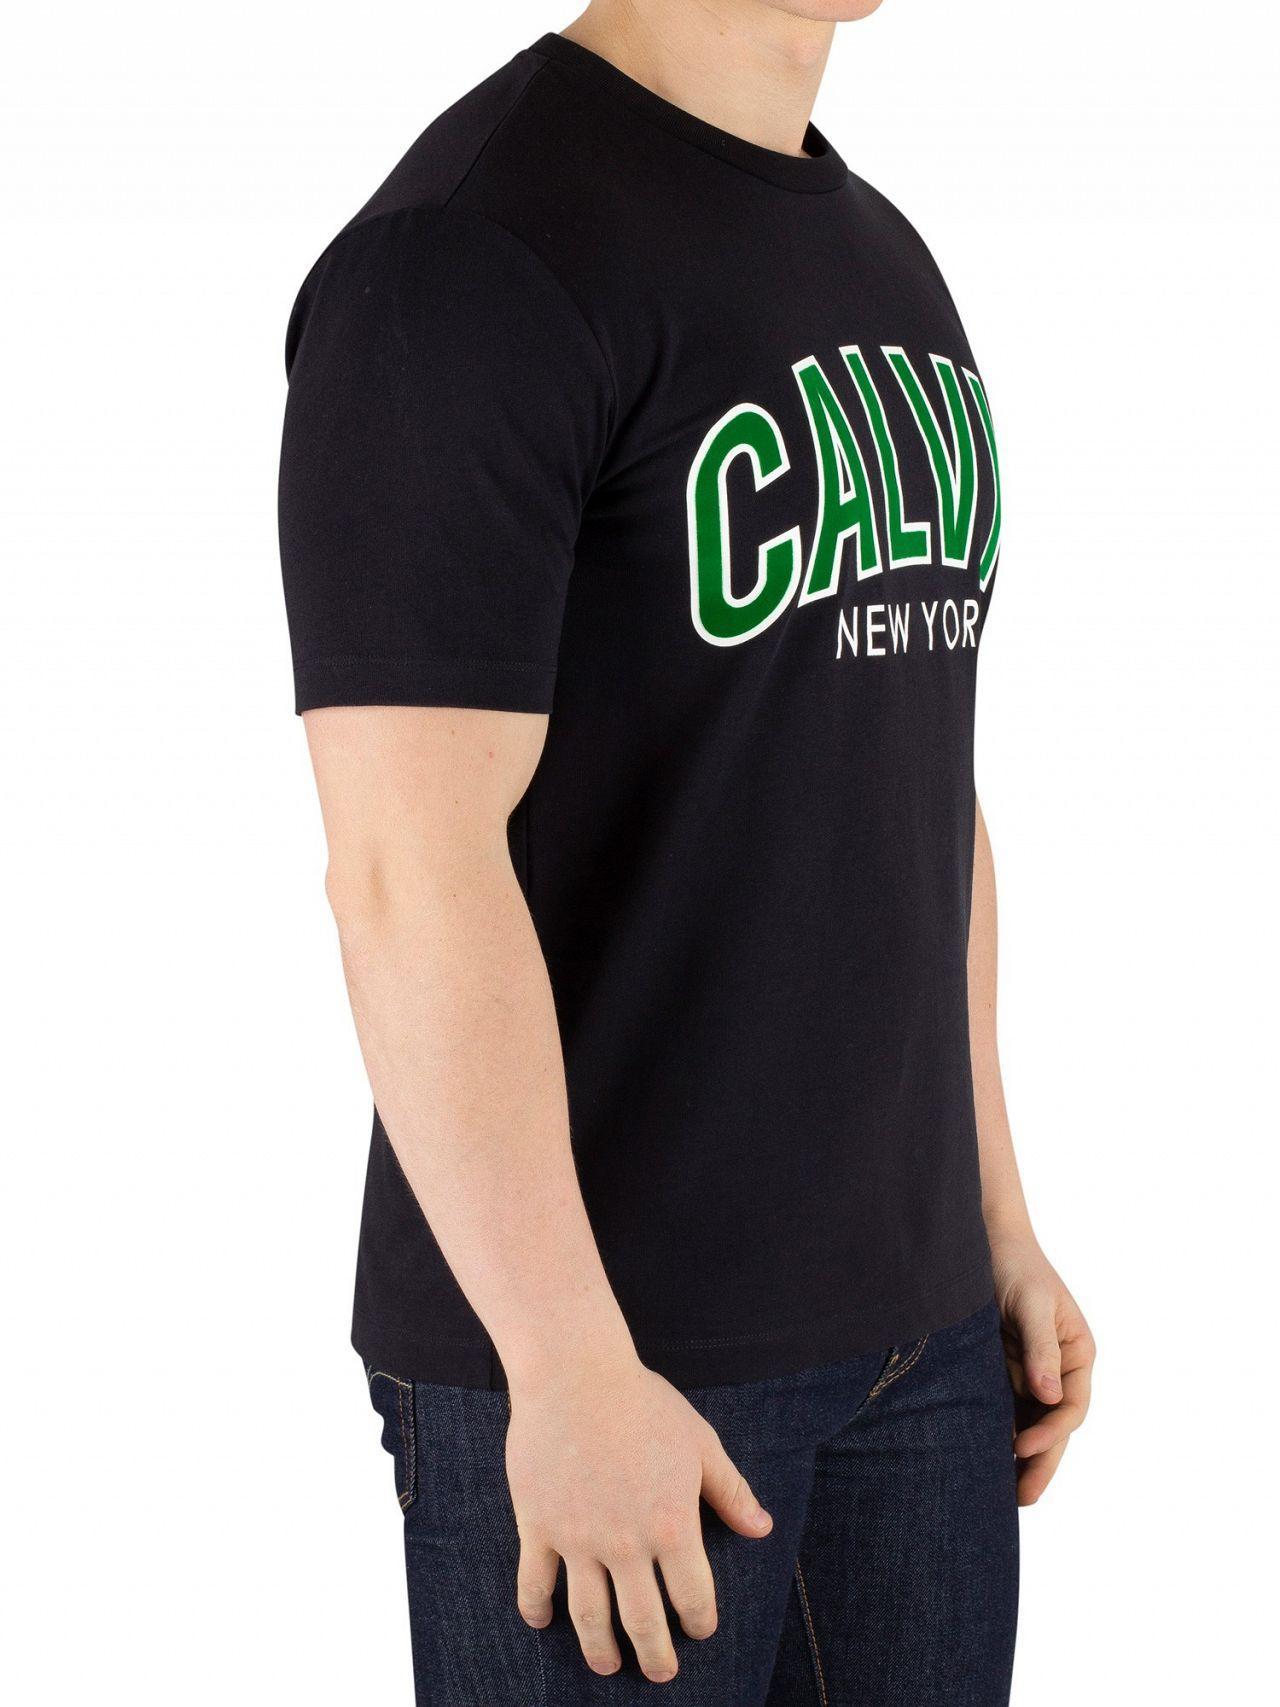 06caace2b9fd Lyst - Calvin Klein Men's Curved Varsity T-shirt, Black Men's T Shirt In  Black in Black for Men